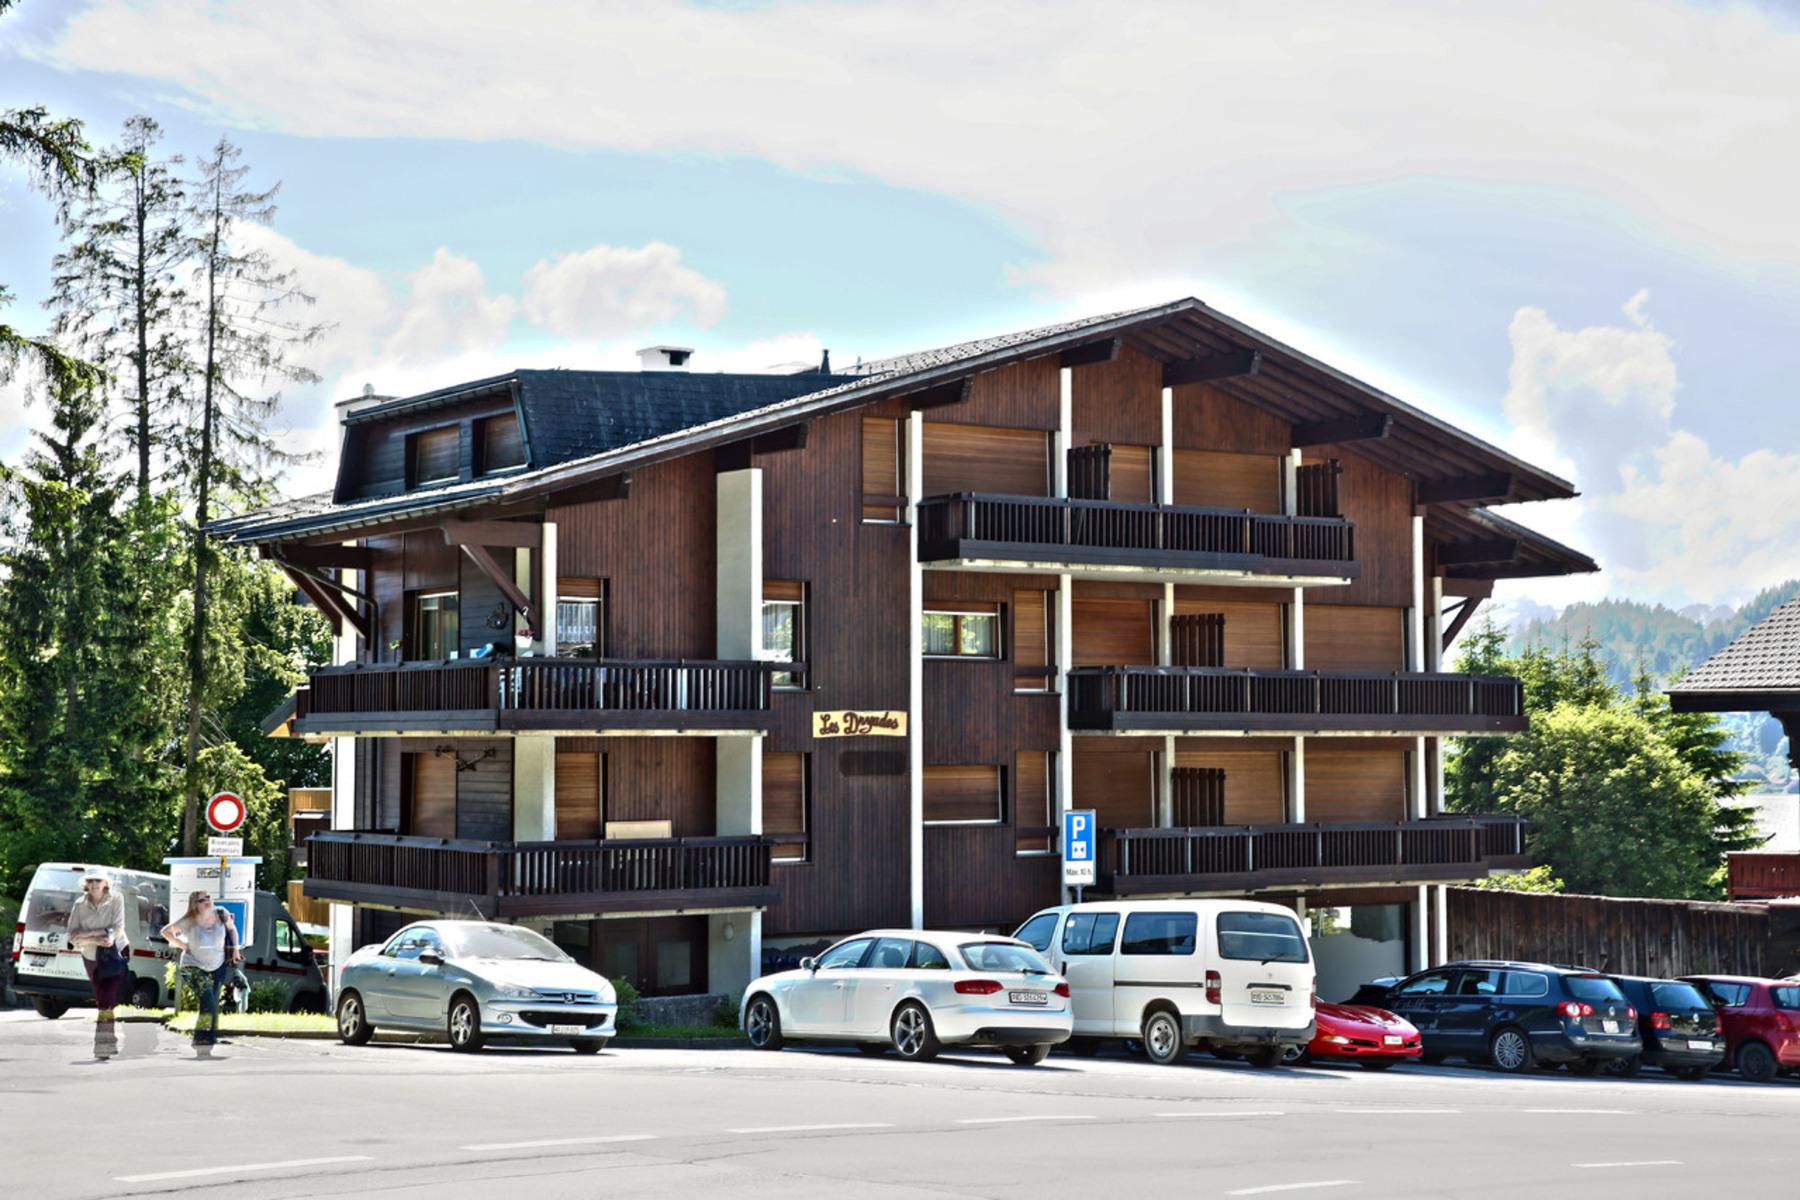 Apartamento para Venda às Les Dryades 7 Route des Hôtels 24 Villars-Sur-Ollon, Vaud, 1884 Suíça